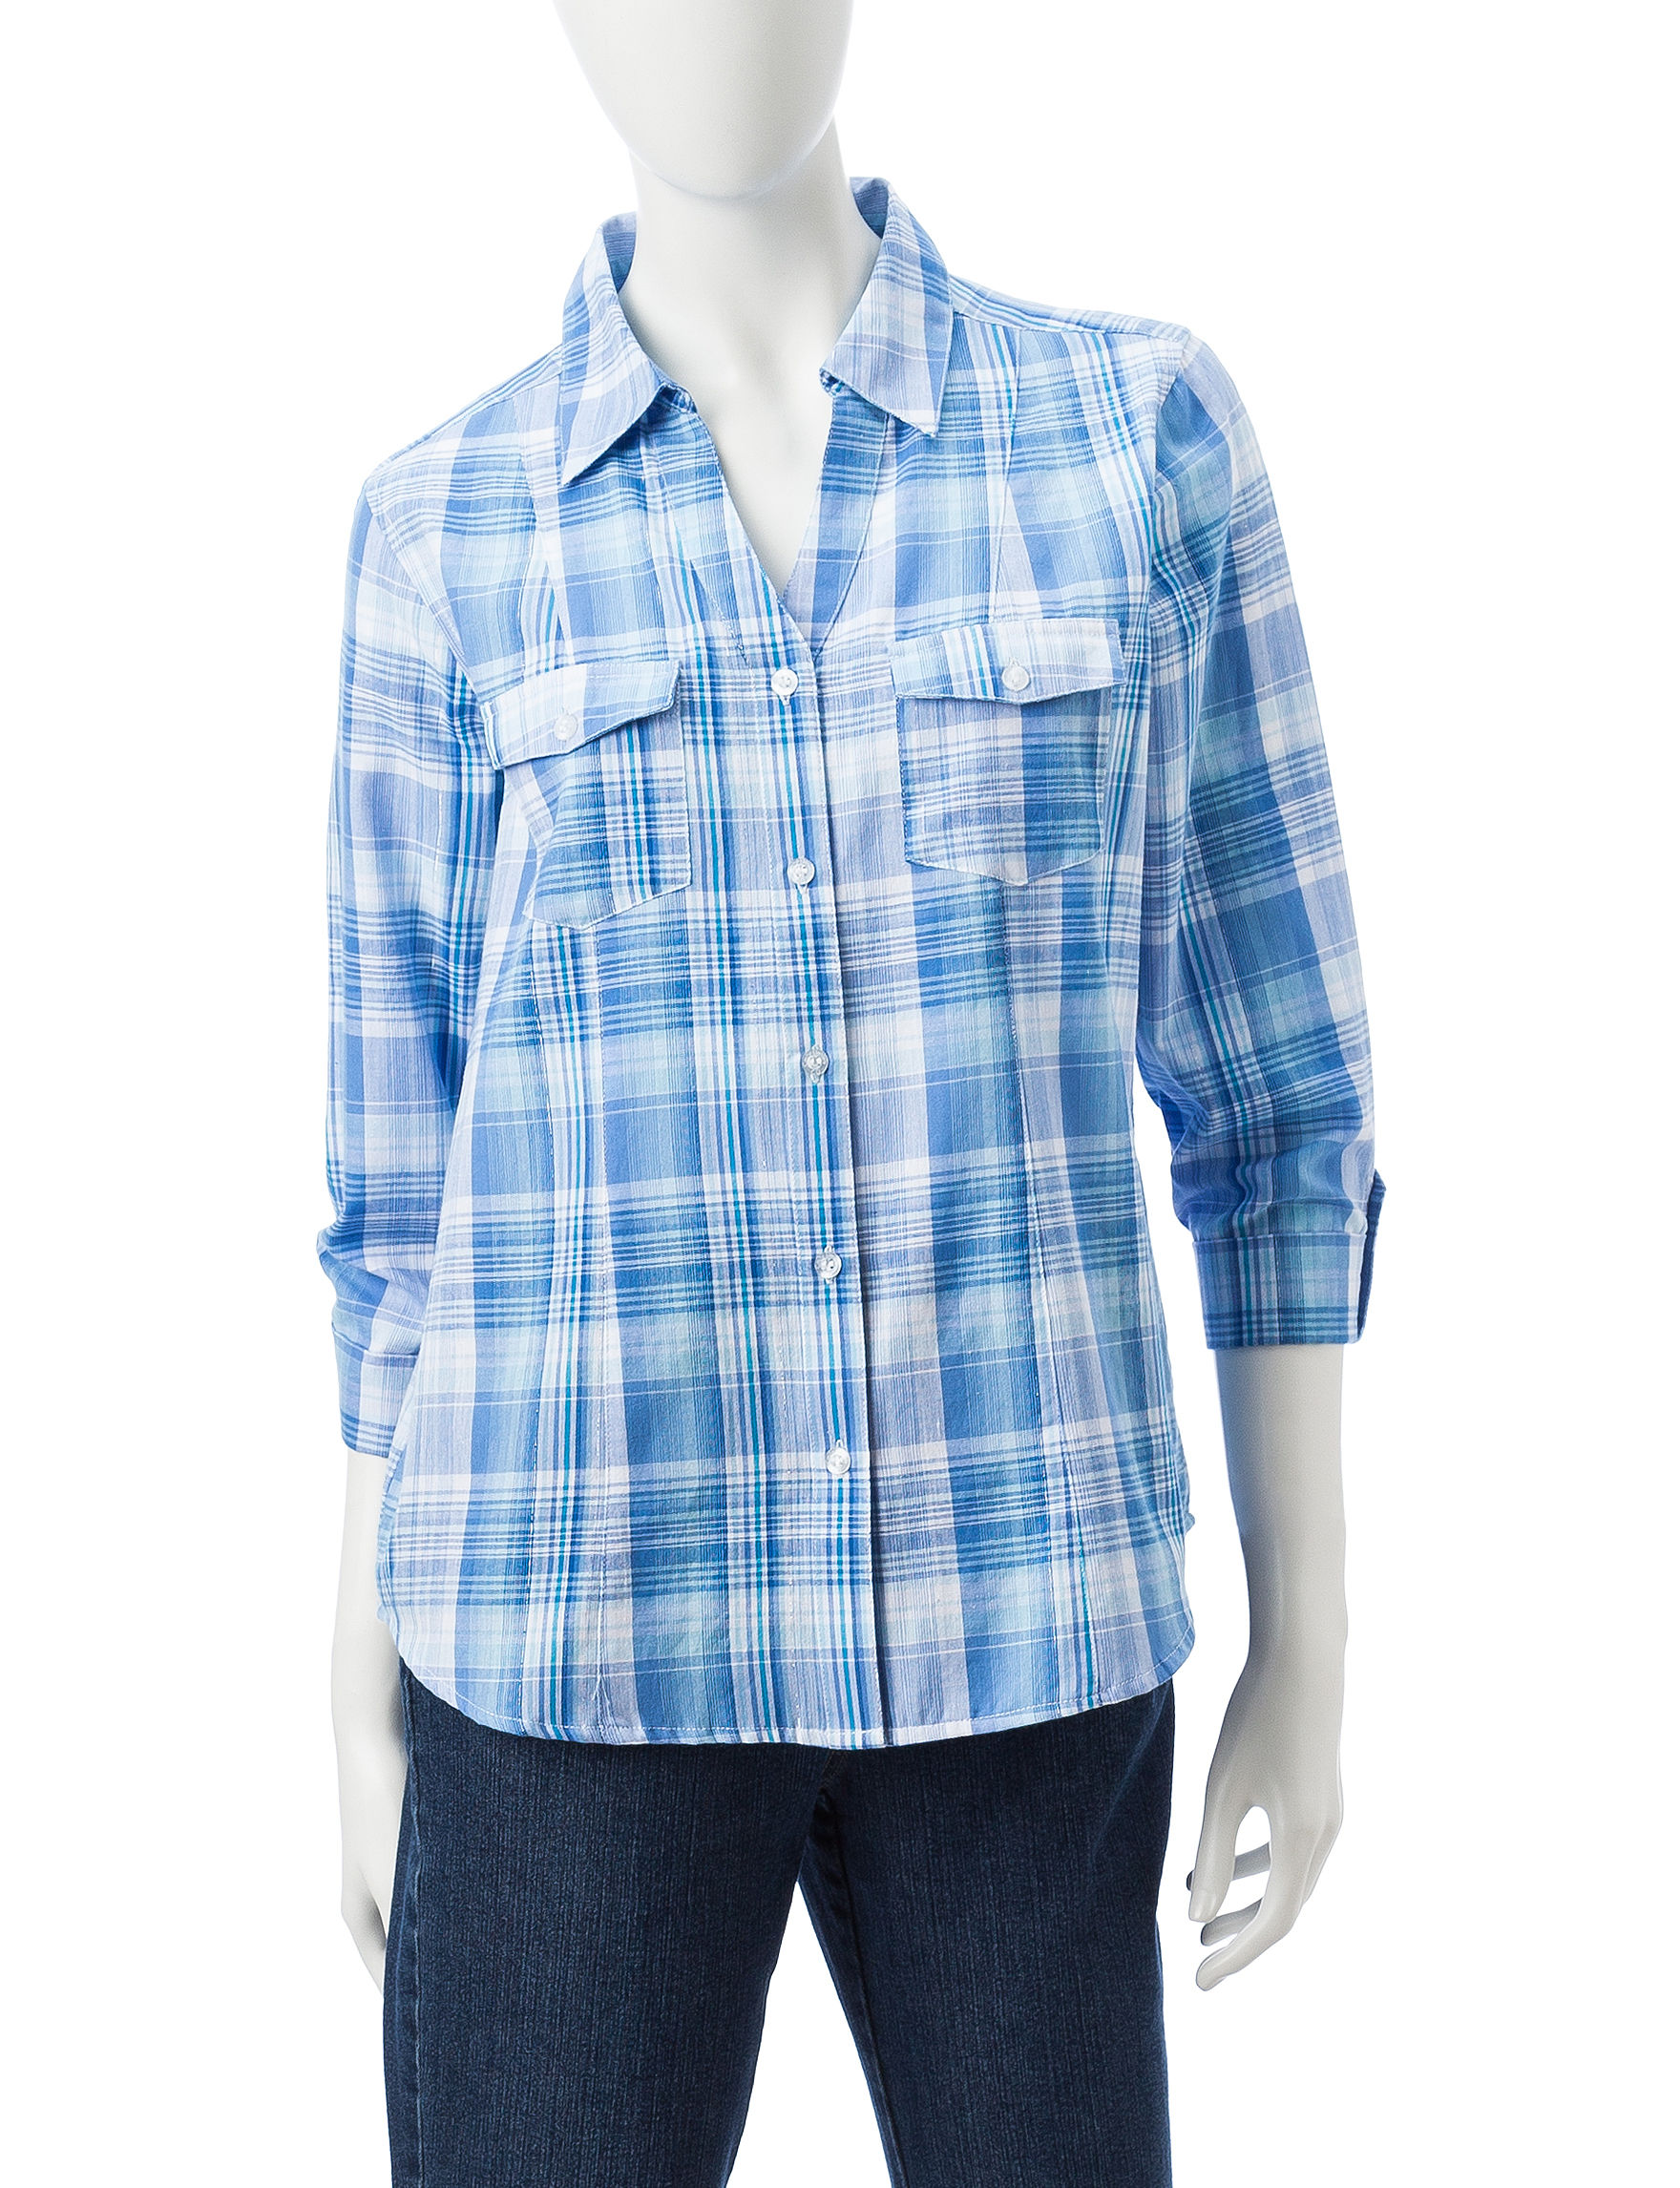 Cathy Daniels Blue Plaid Shirts & Blouses